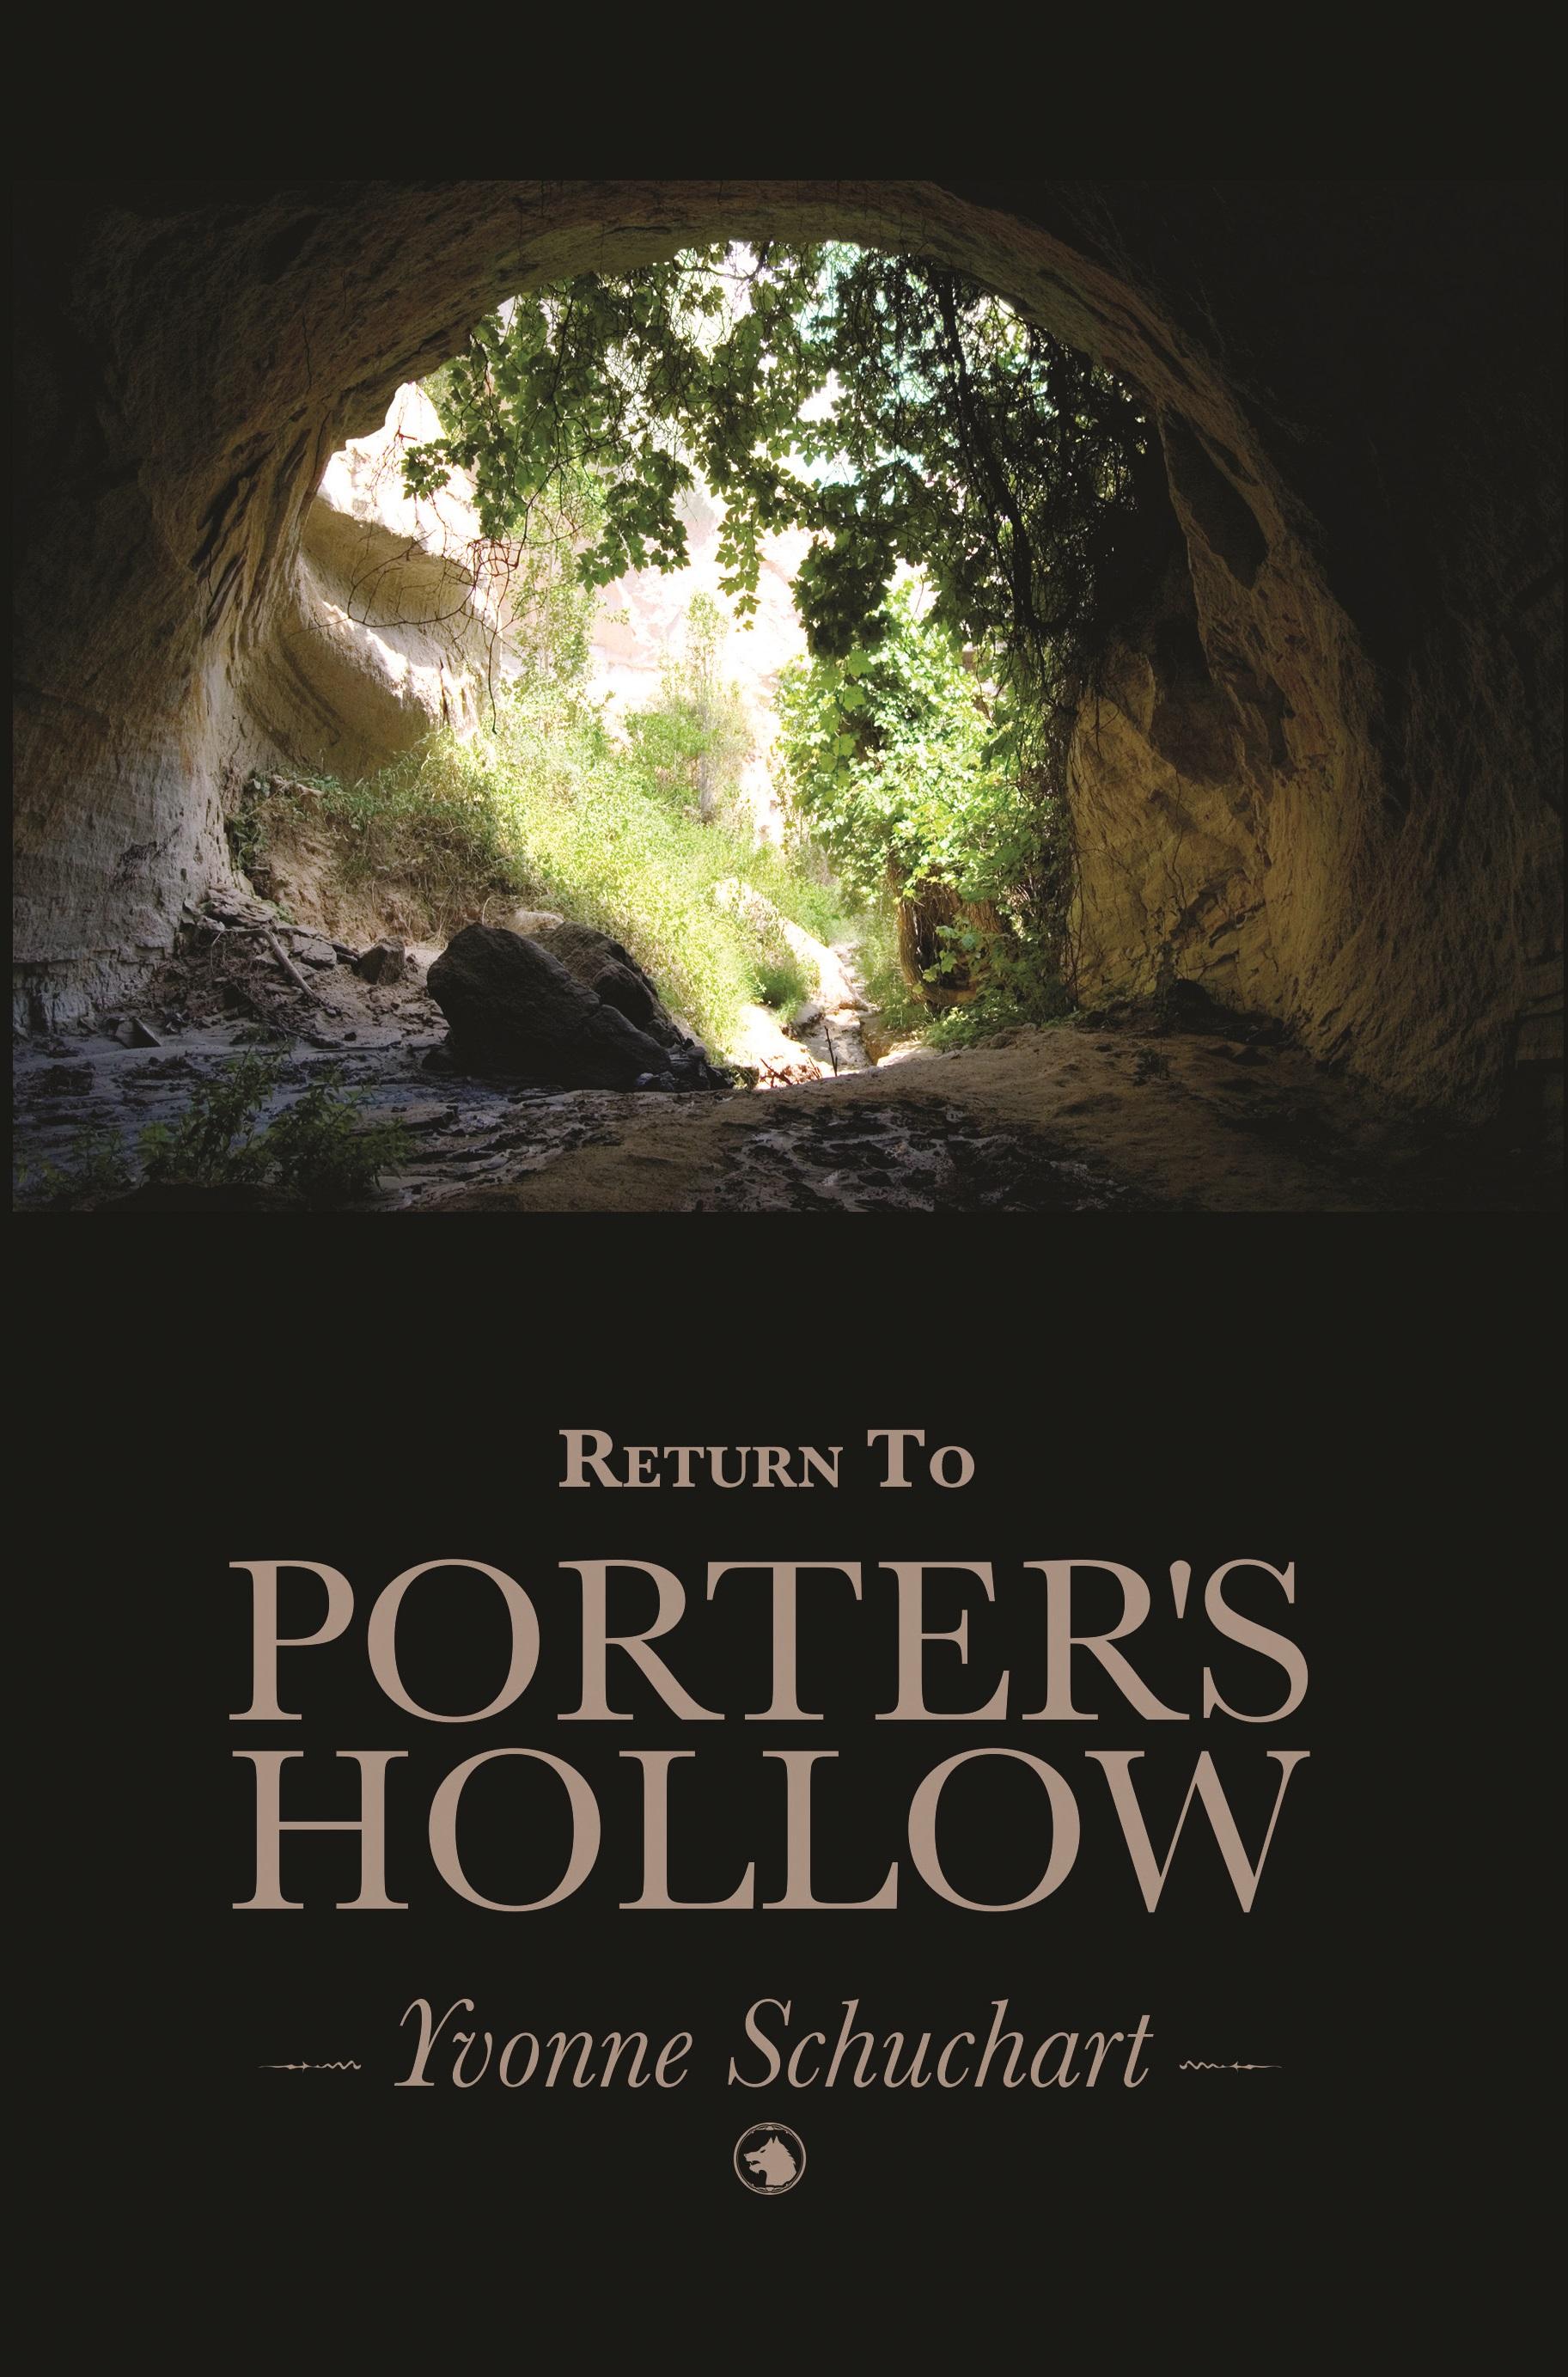 Return to Porter's Hollow by Yvonne Schuchart